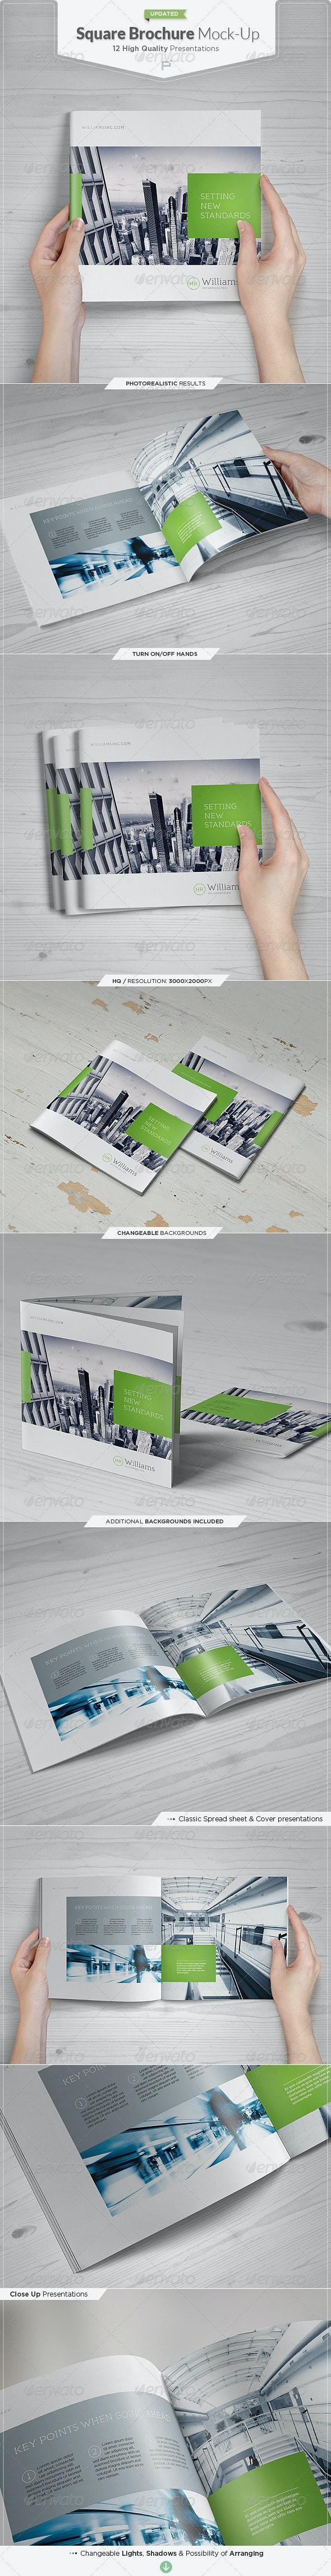 Square Brochure / Catalog Mock-Up Set - Brochures Print